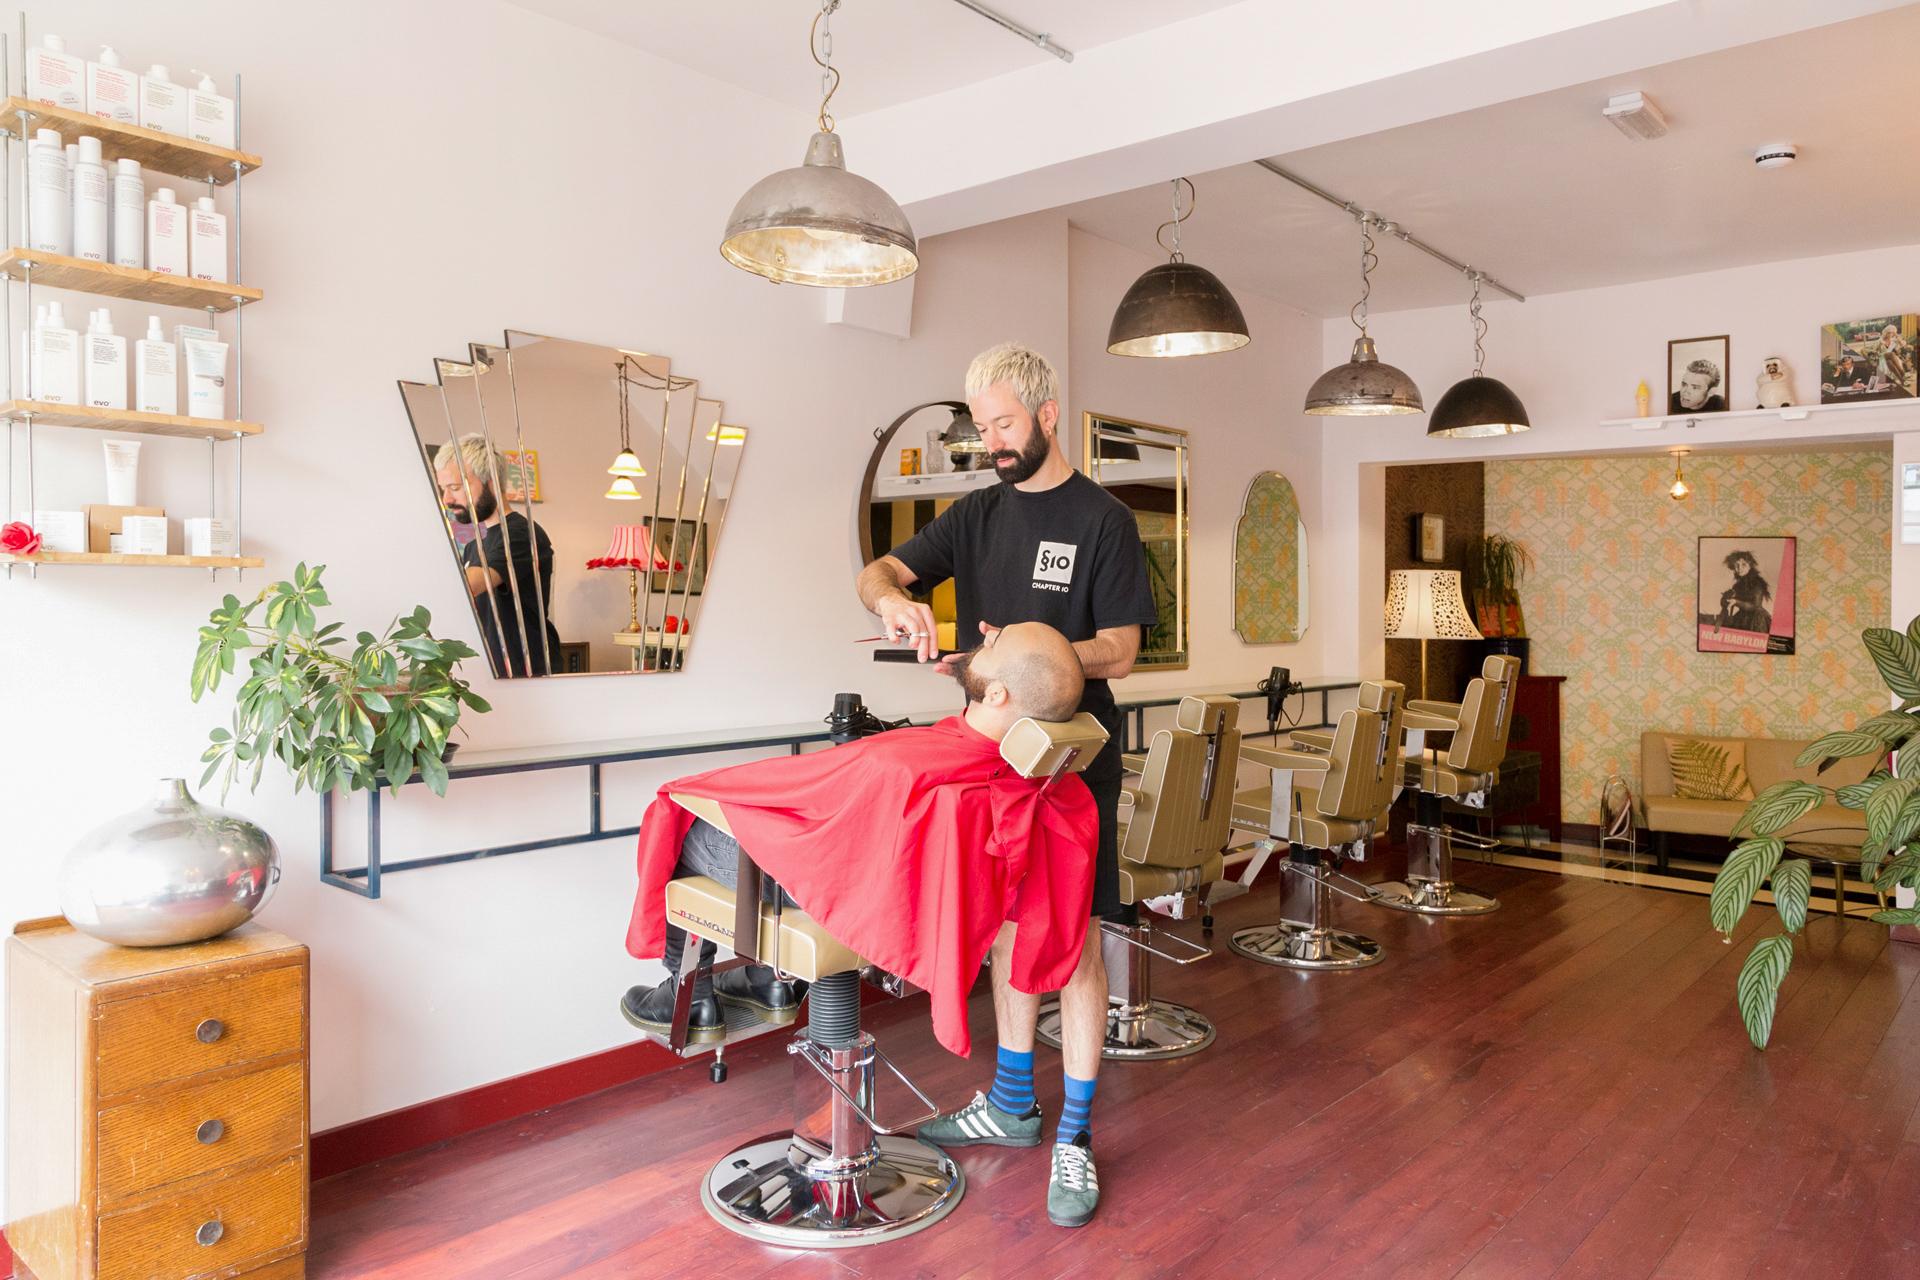 James cutting hair at WhiP Hackney